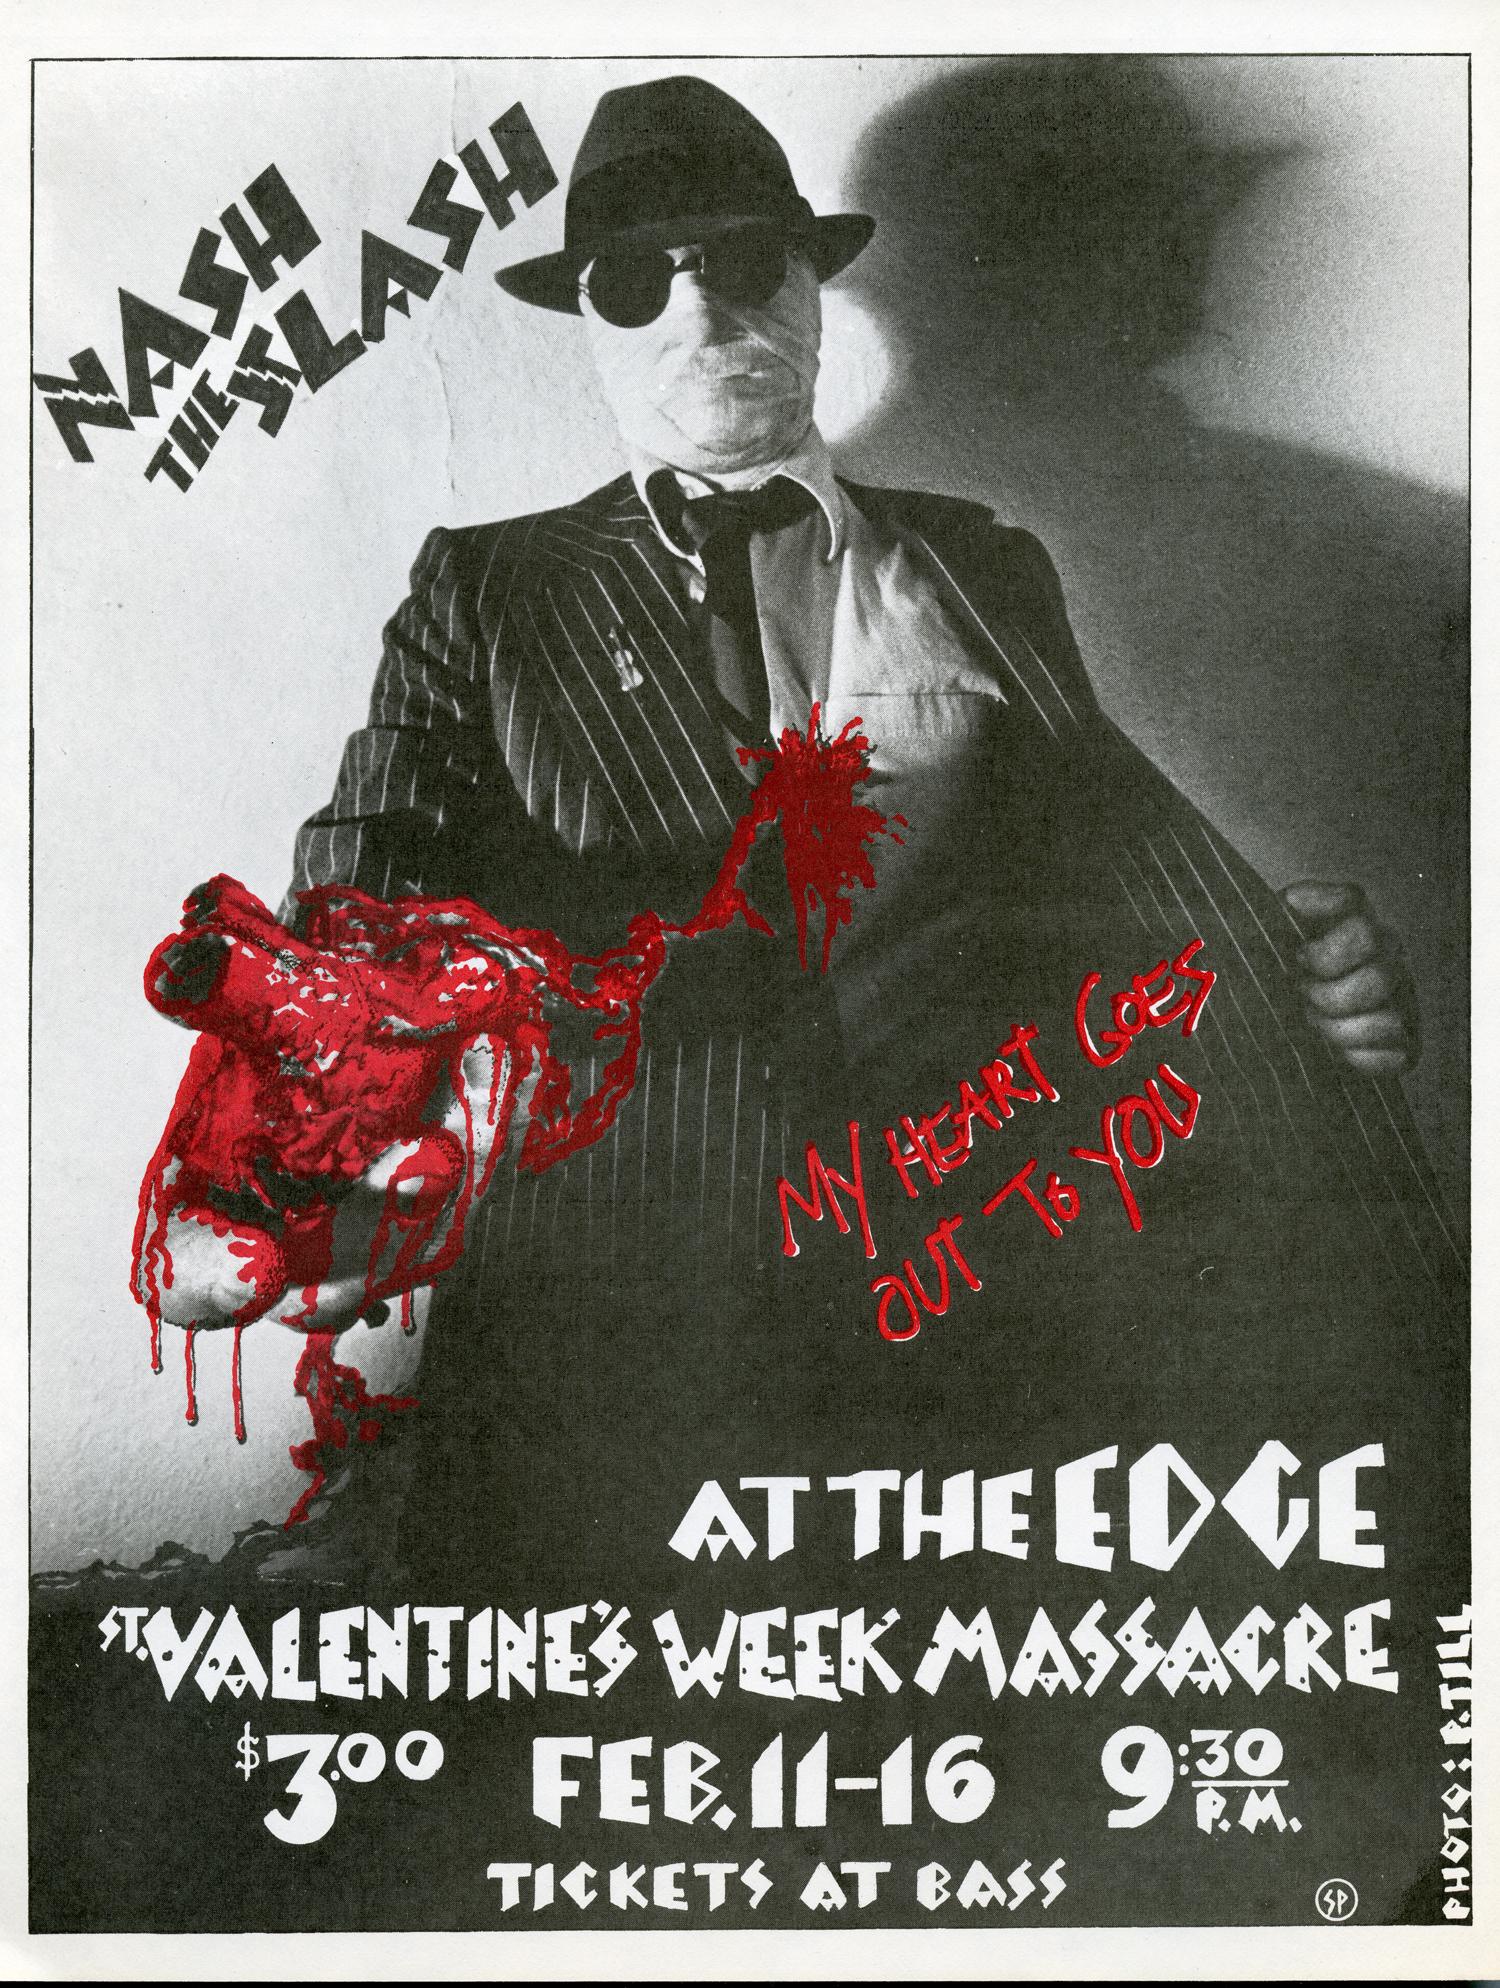 St. Valentine's Week Massacre, design by Nash and photographer Paul Till, 1980.